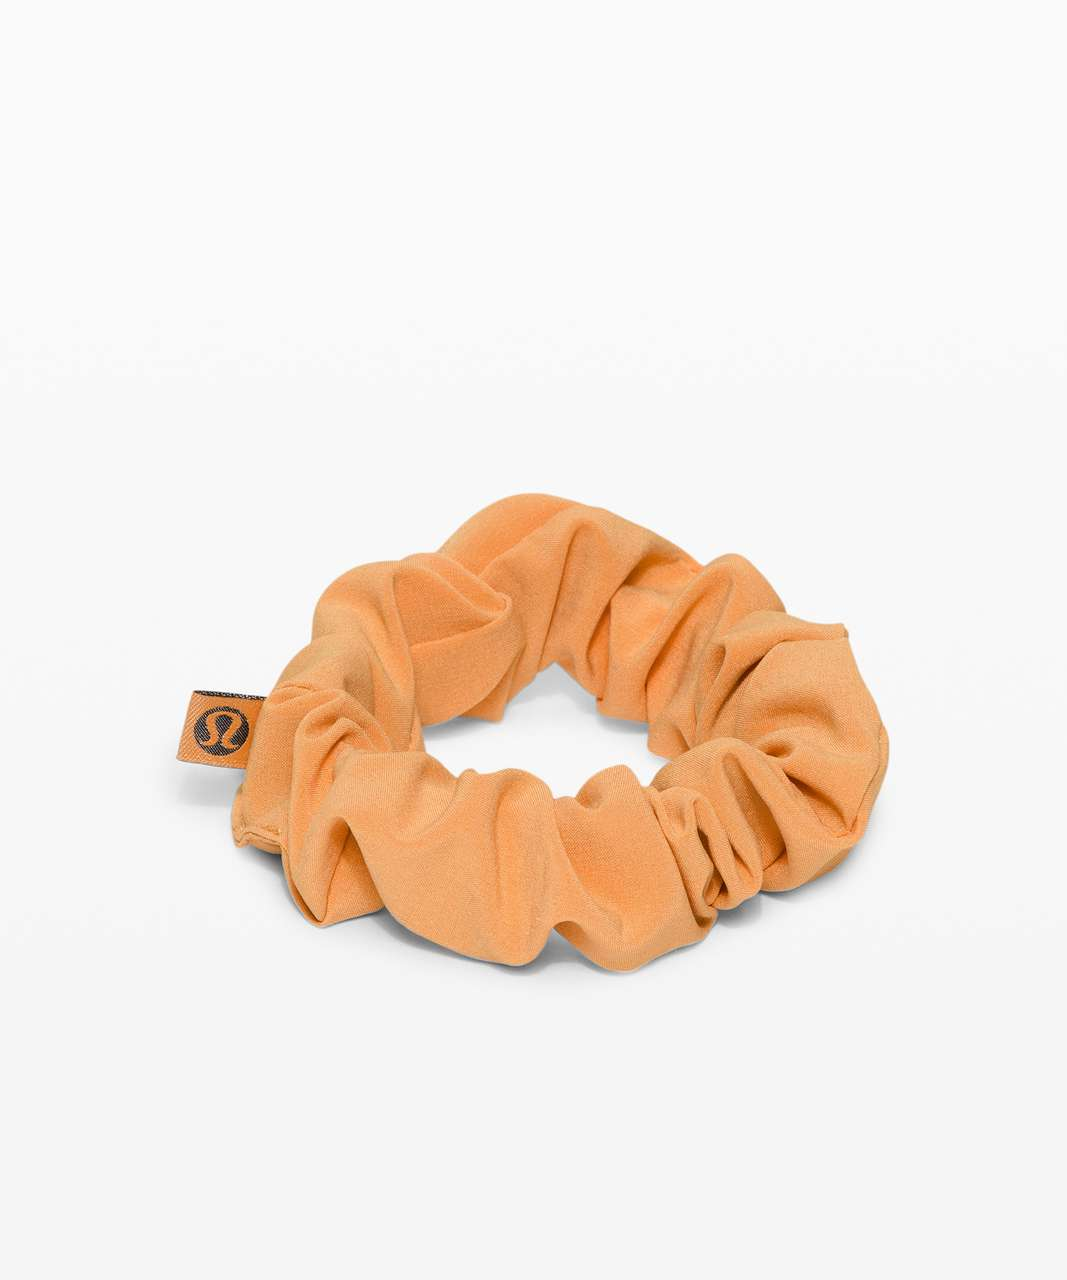 Lululemon Uplifting Scrunchie - Monarch Orange